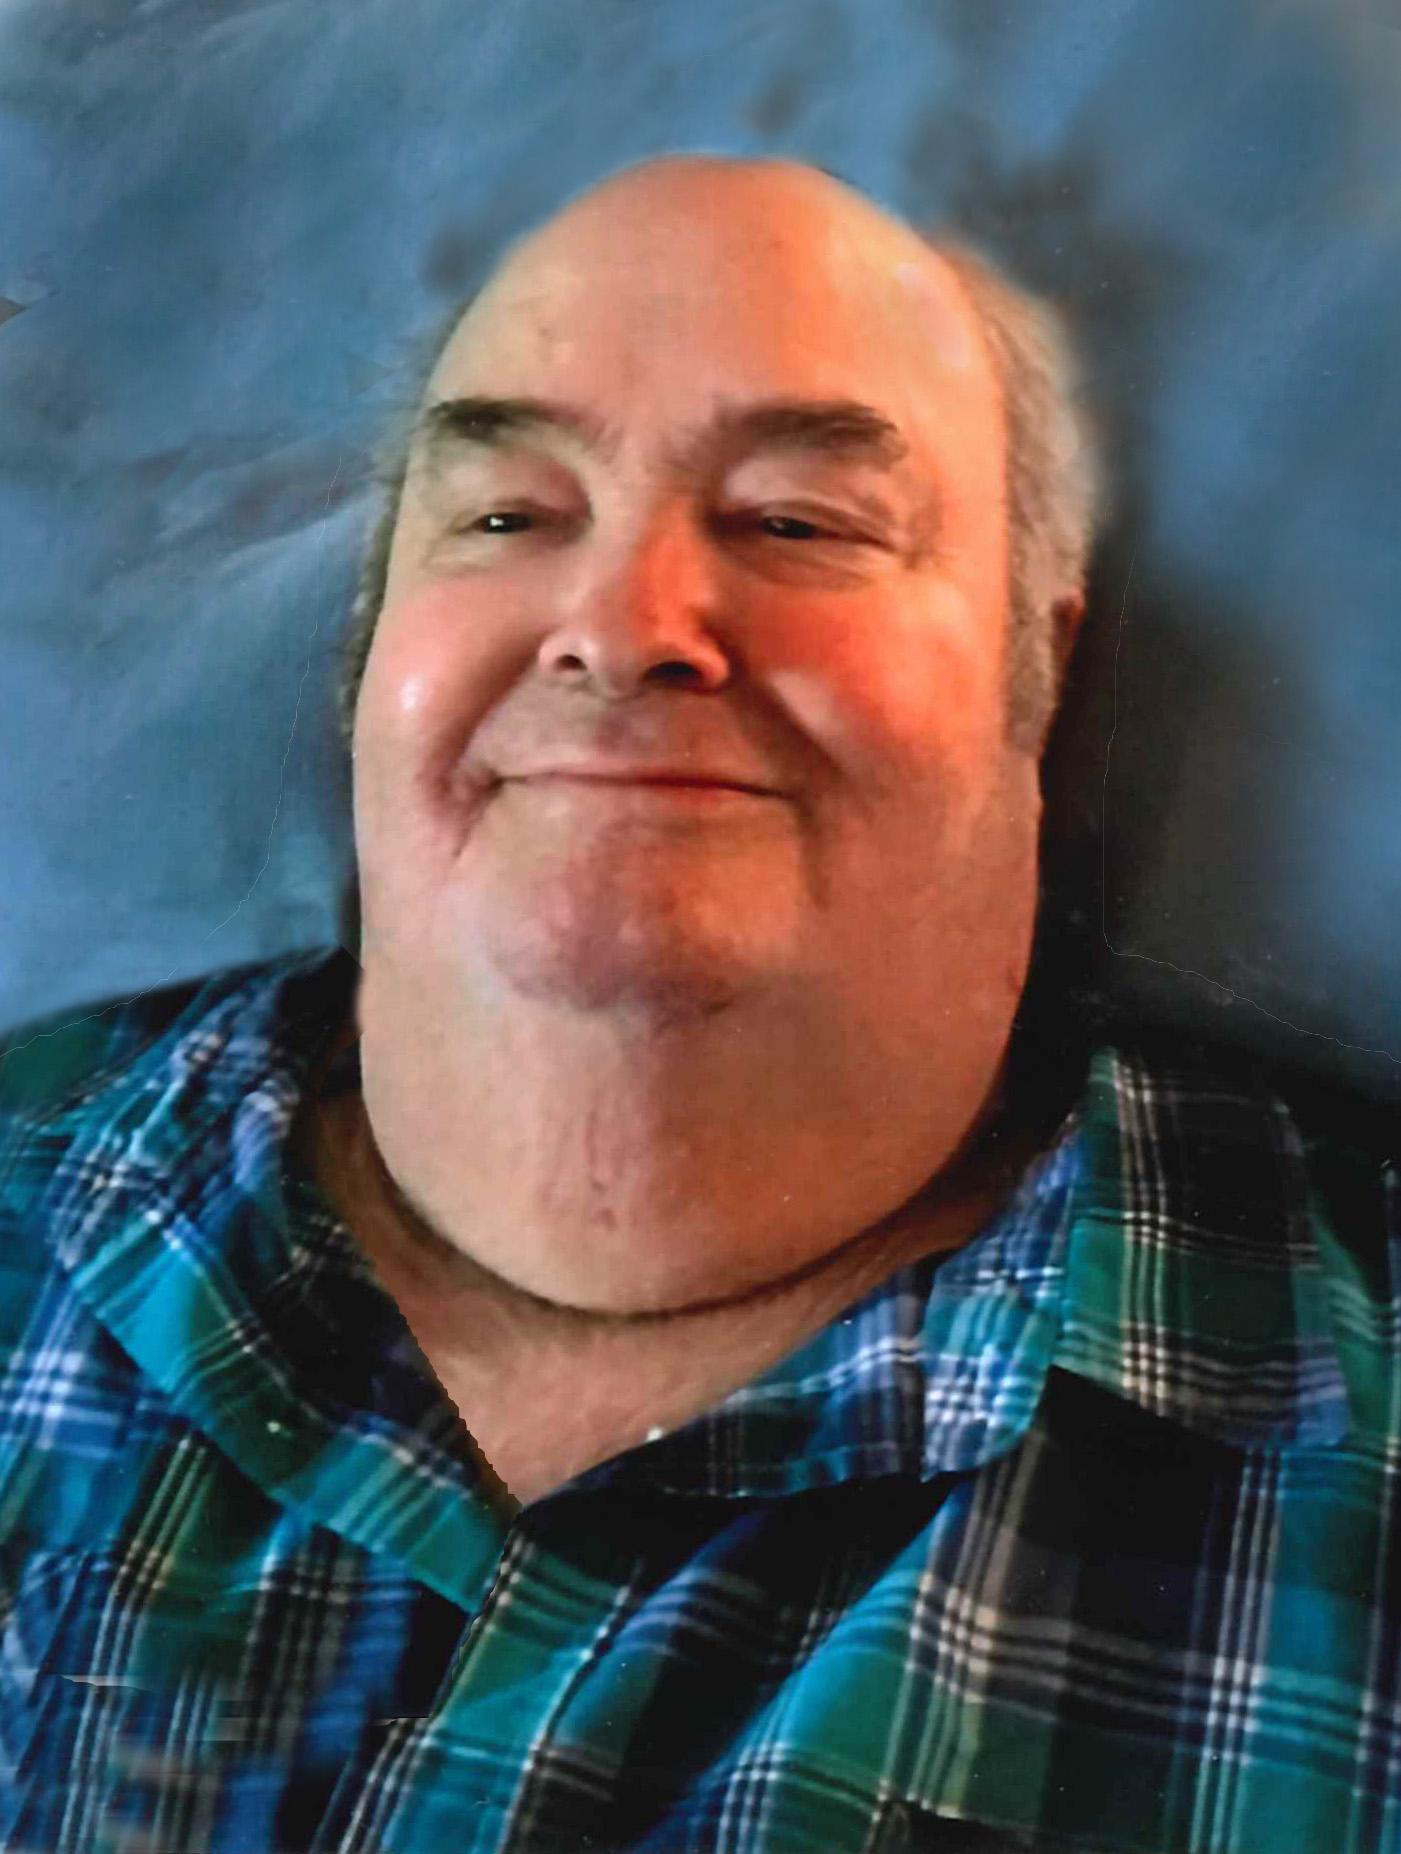 Russell Eugene Covey, 71 years of age, of Ragan, Nebraska